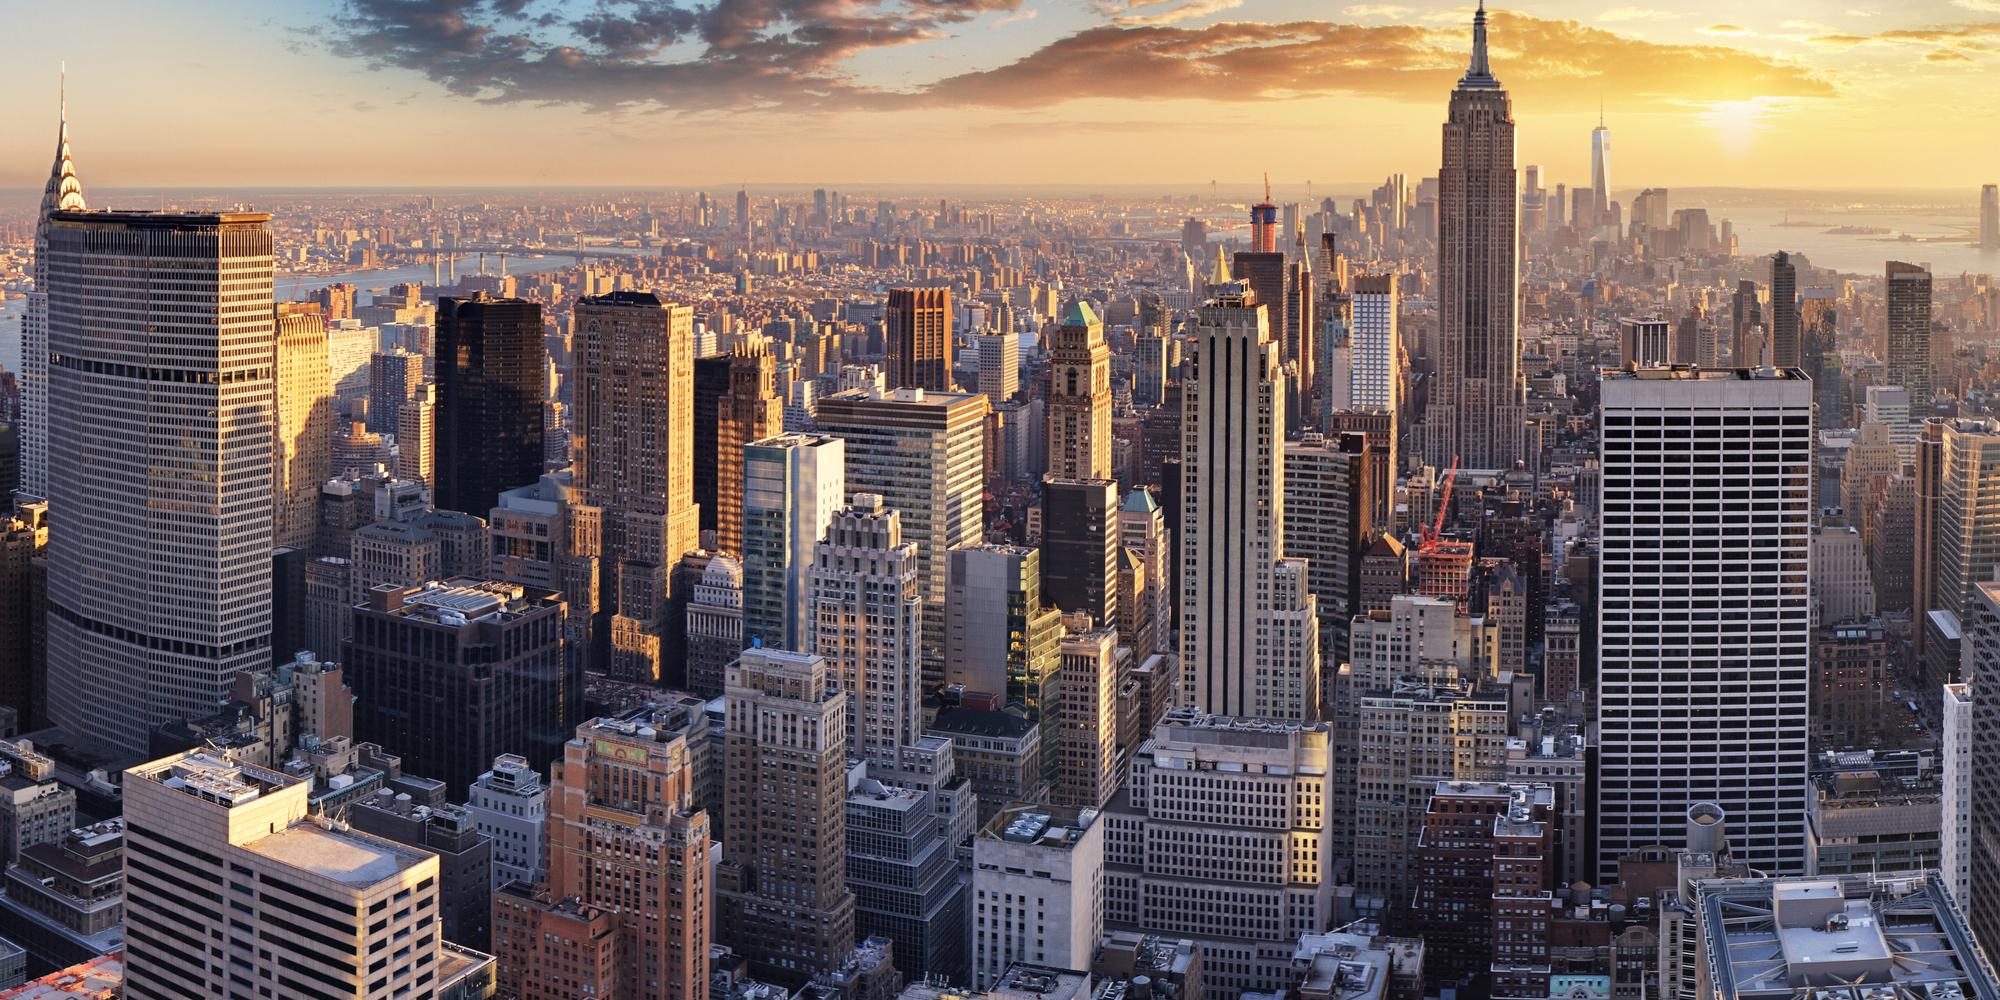 New-York-City,-NYC,-USA-615398376_2202x1365